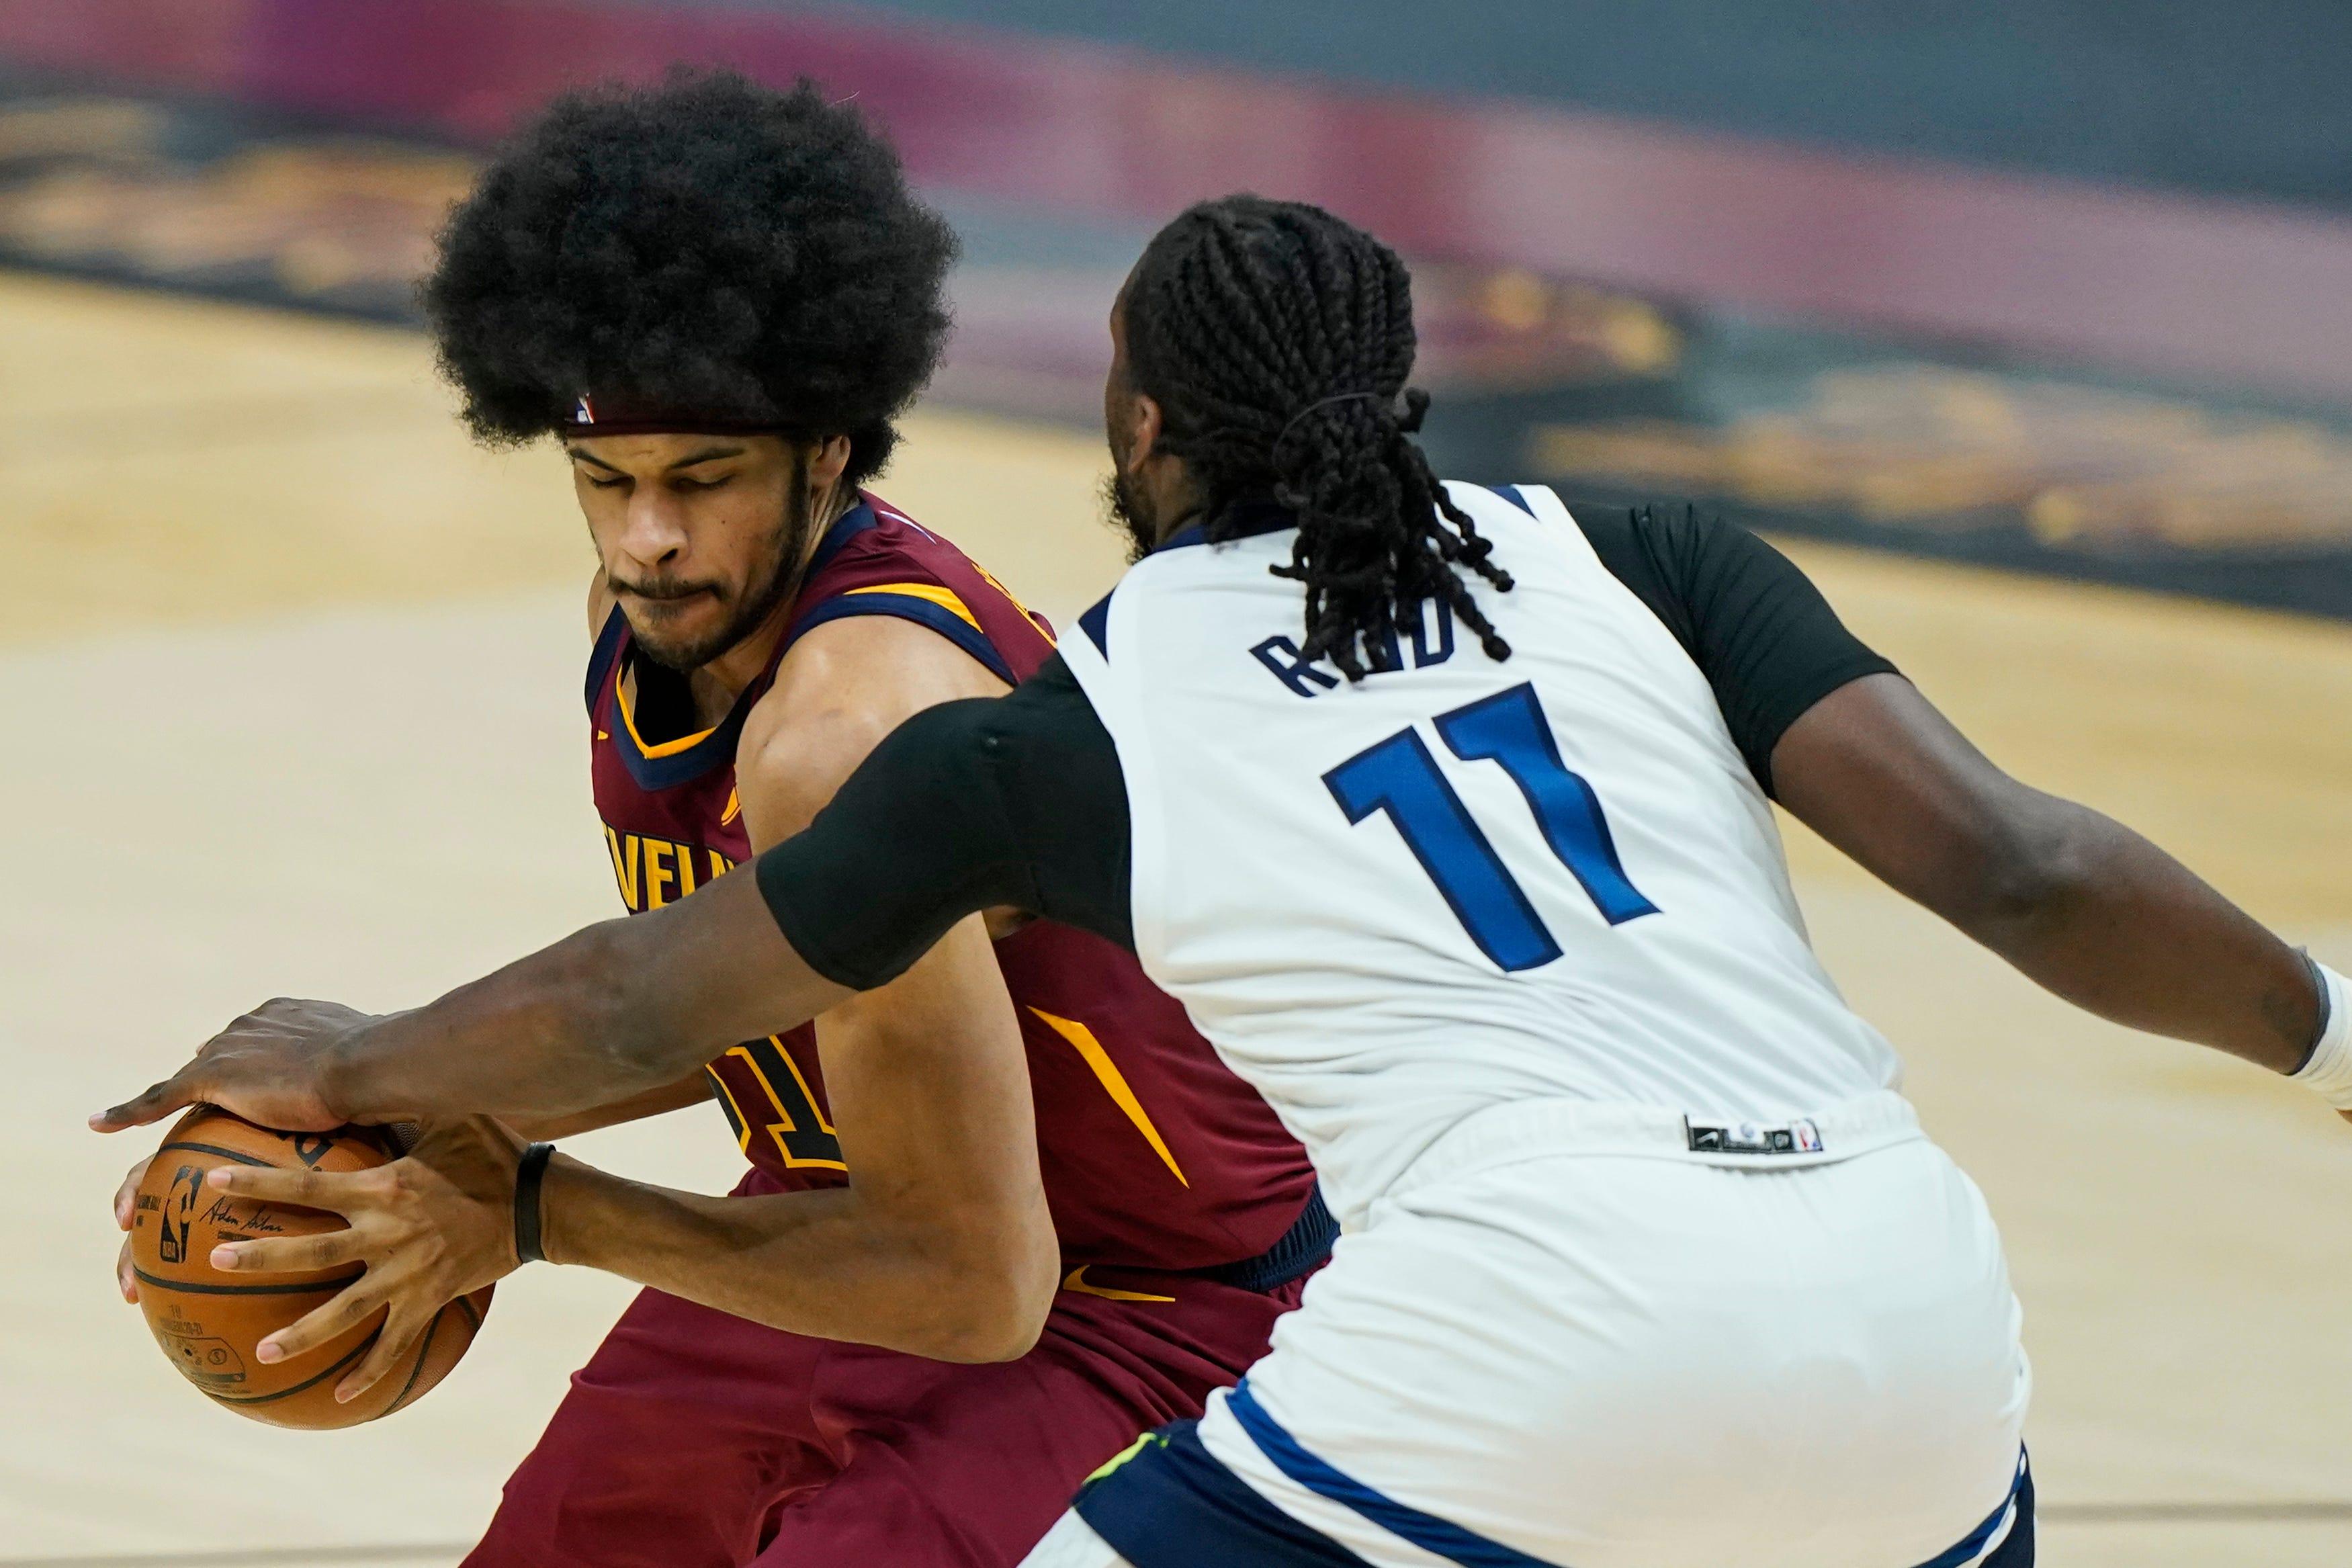 Cavaliers 100, Timberwolves 98: Collin Sexton, Jarrett Allen power Cavs